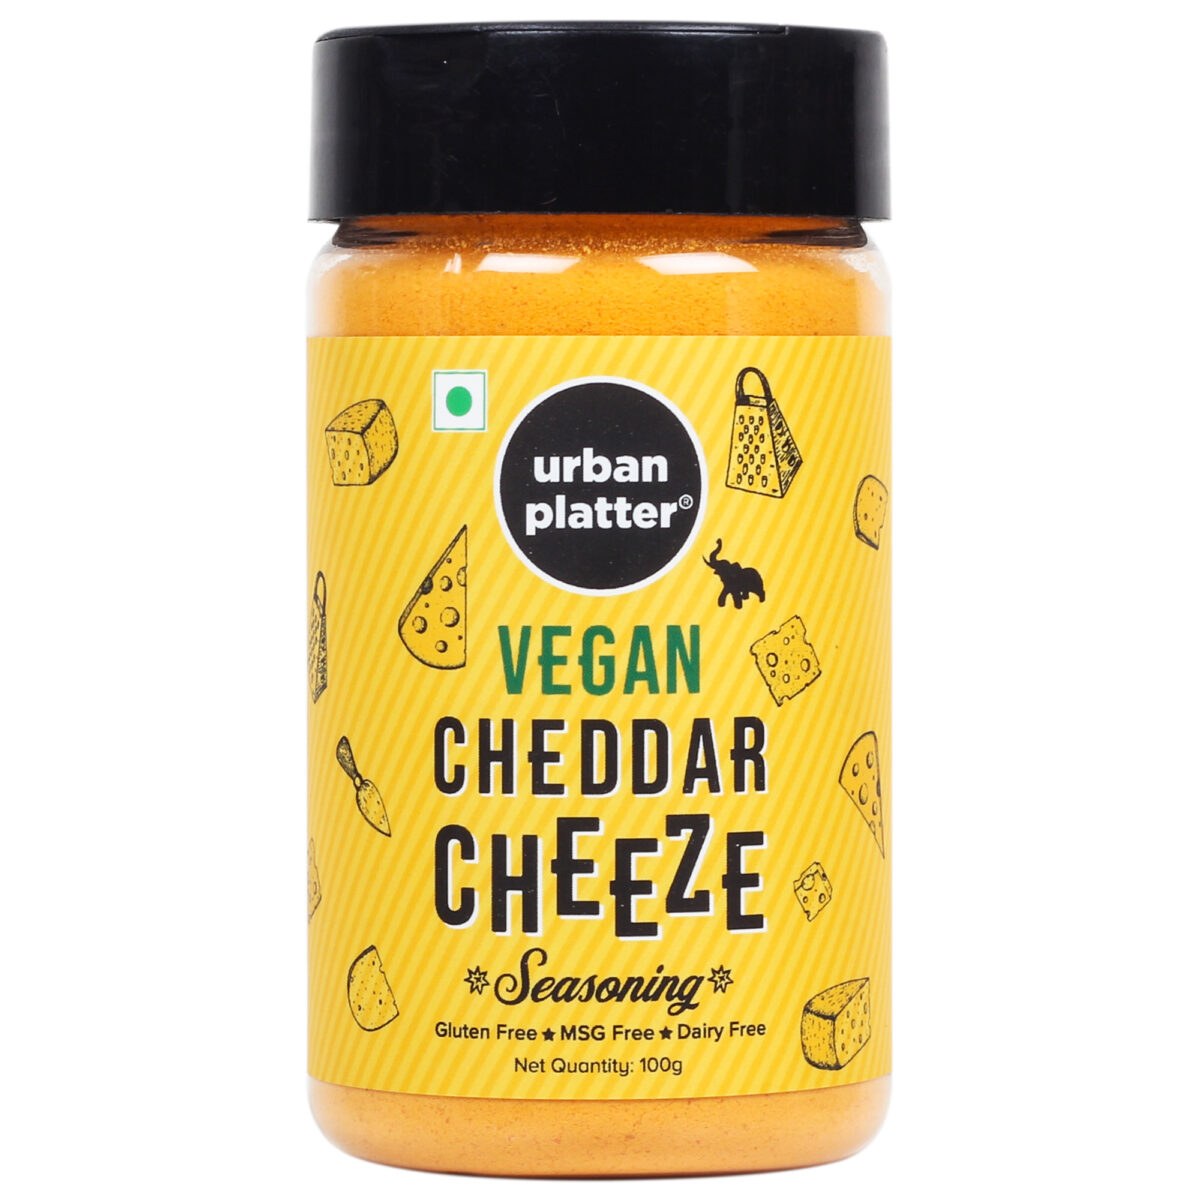 Urban Platter Cheddar Cheese Powder, 100g (Perfect for Pop Corn, Pasta, Fries Seasoning | Dairy-free | Vegan)